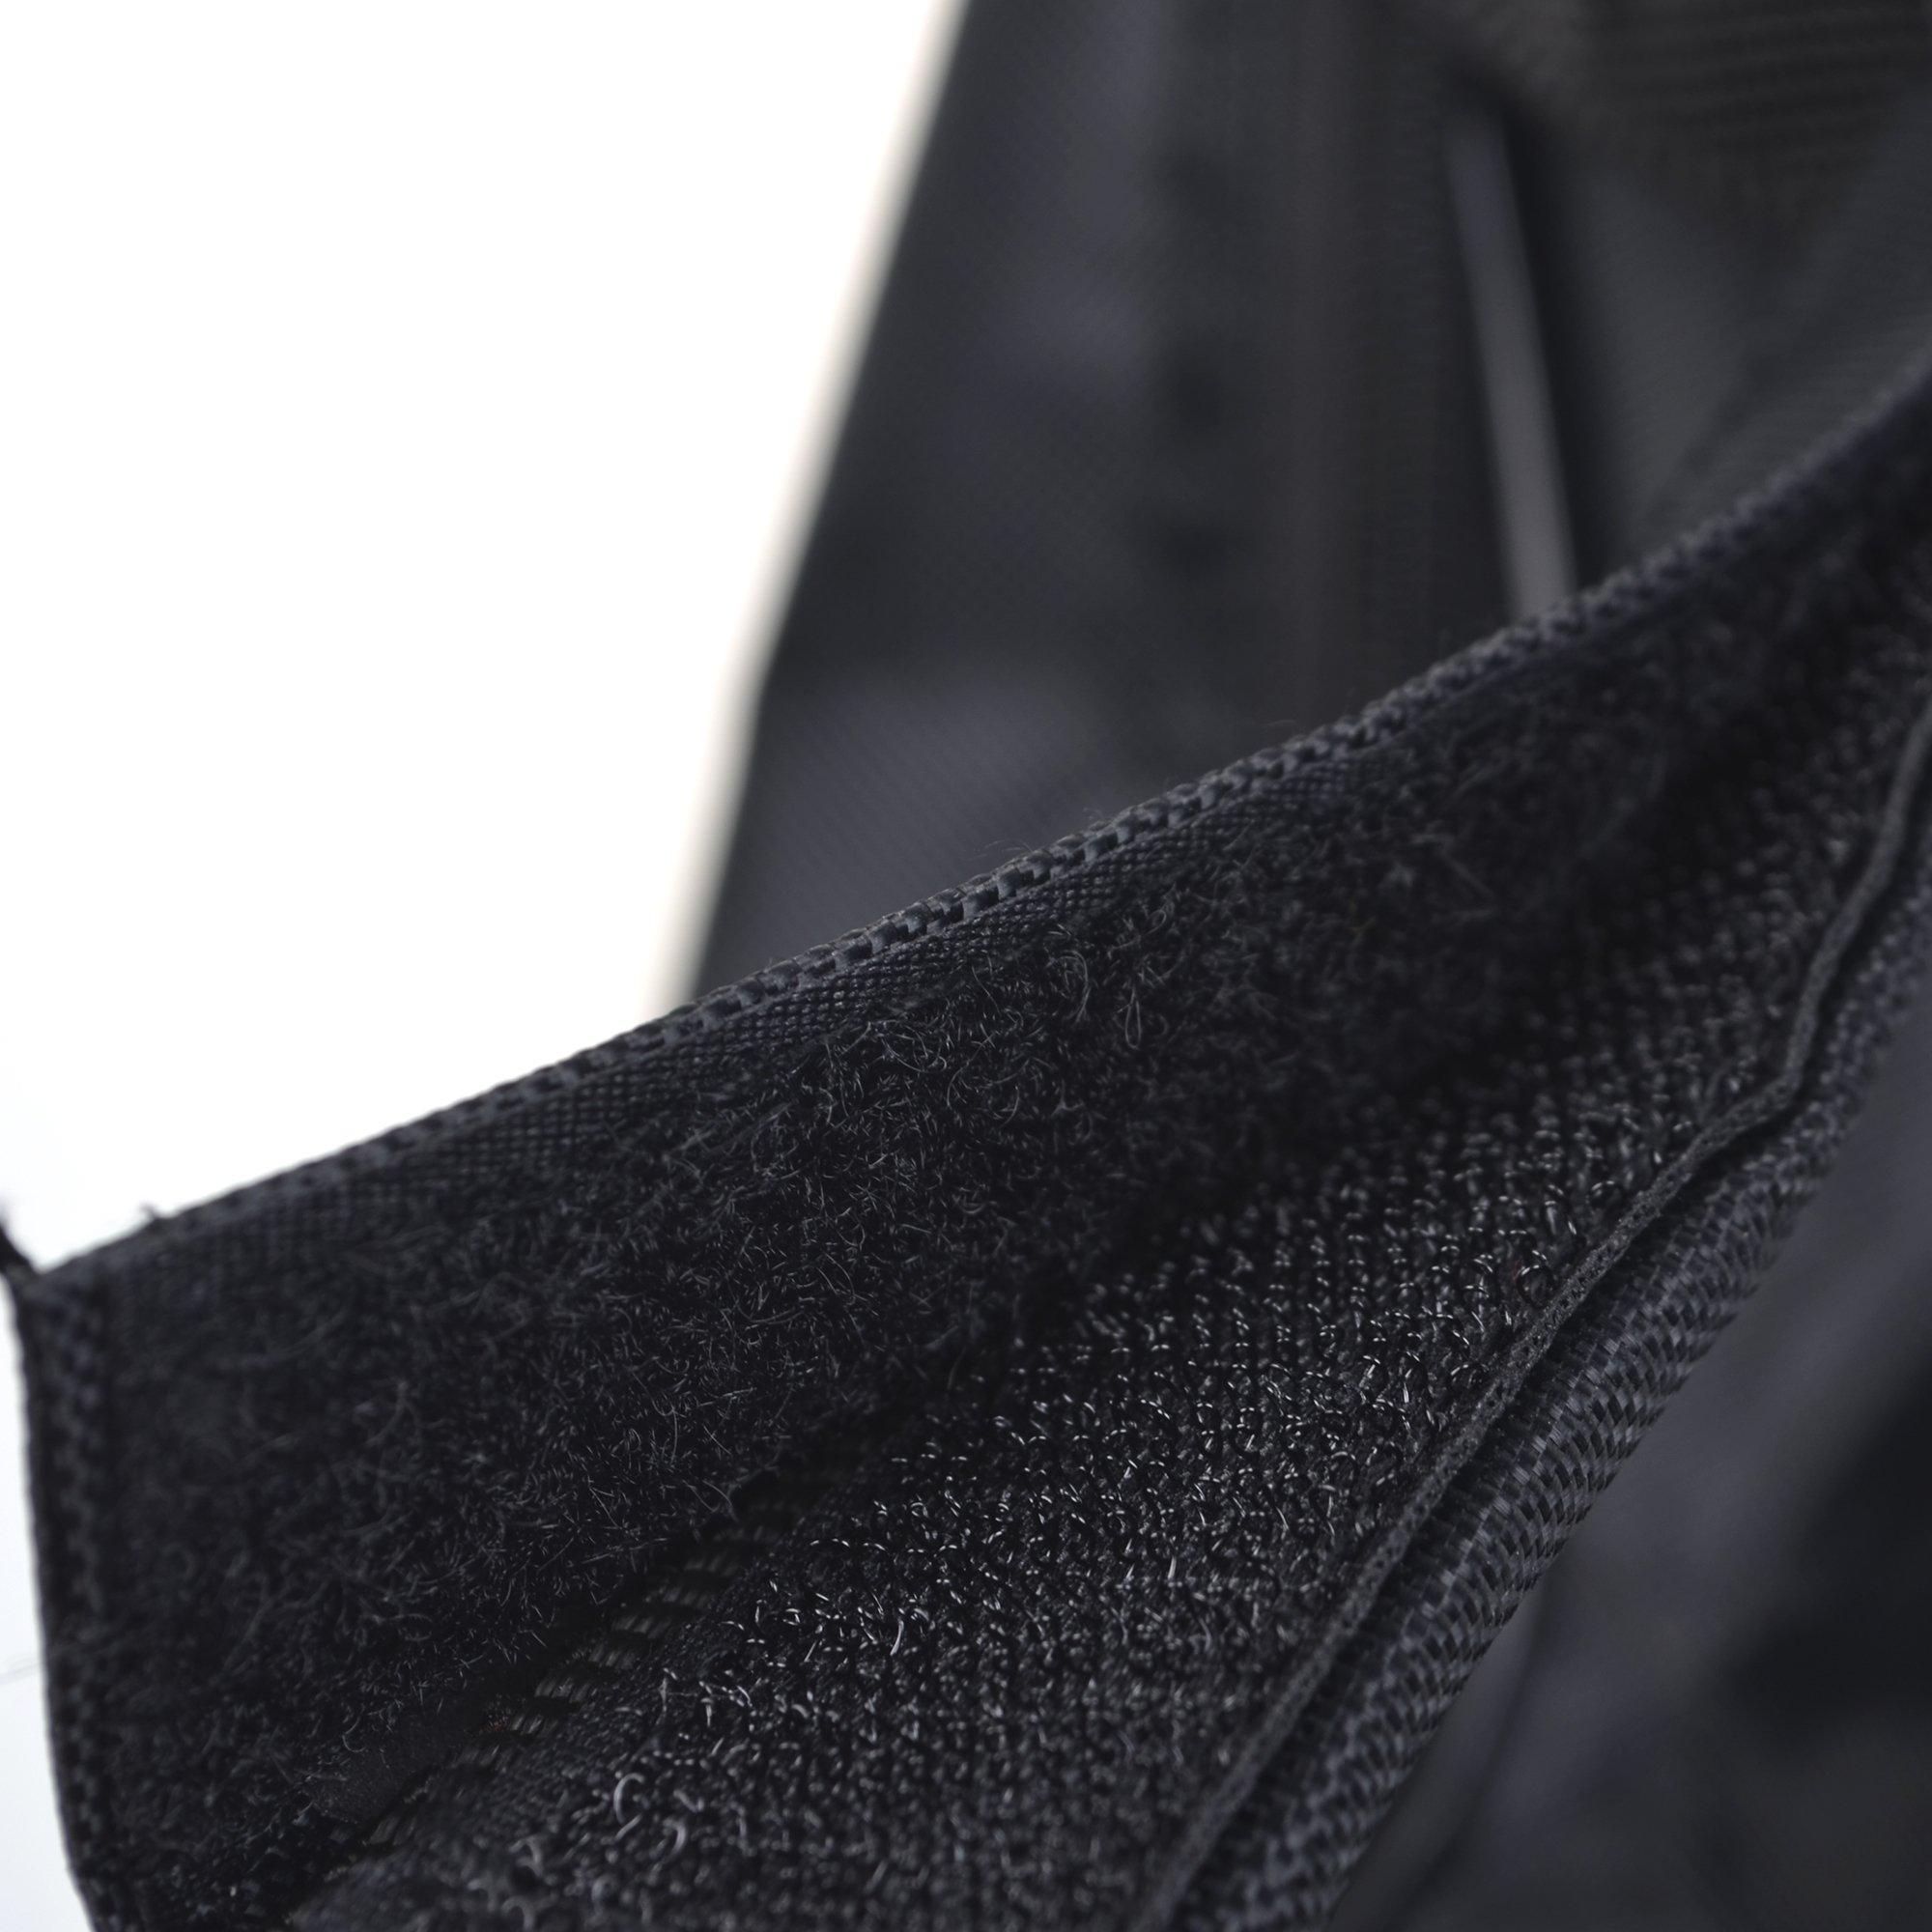 ASTVSHOP E-Scooter Storage Handlebar Bag M365 Accessories Head Handle Front Carrying Bag for Xiaomi Mijia M365//Mi365 Mi Pro//ES1 ES2 ES3 ES4 ES Series Ninebots Electric Scooter Waterproof